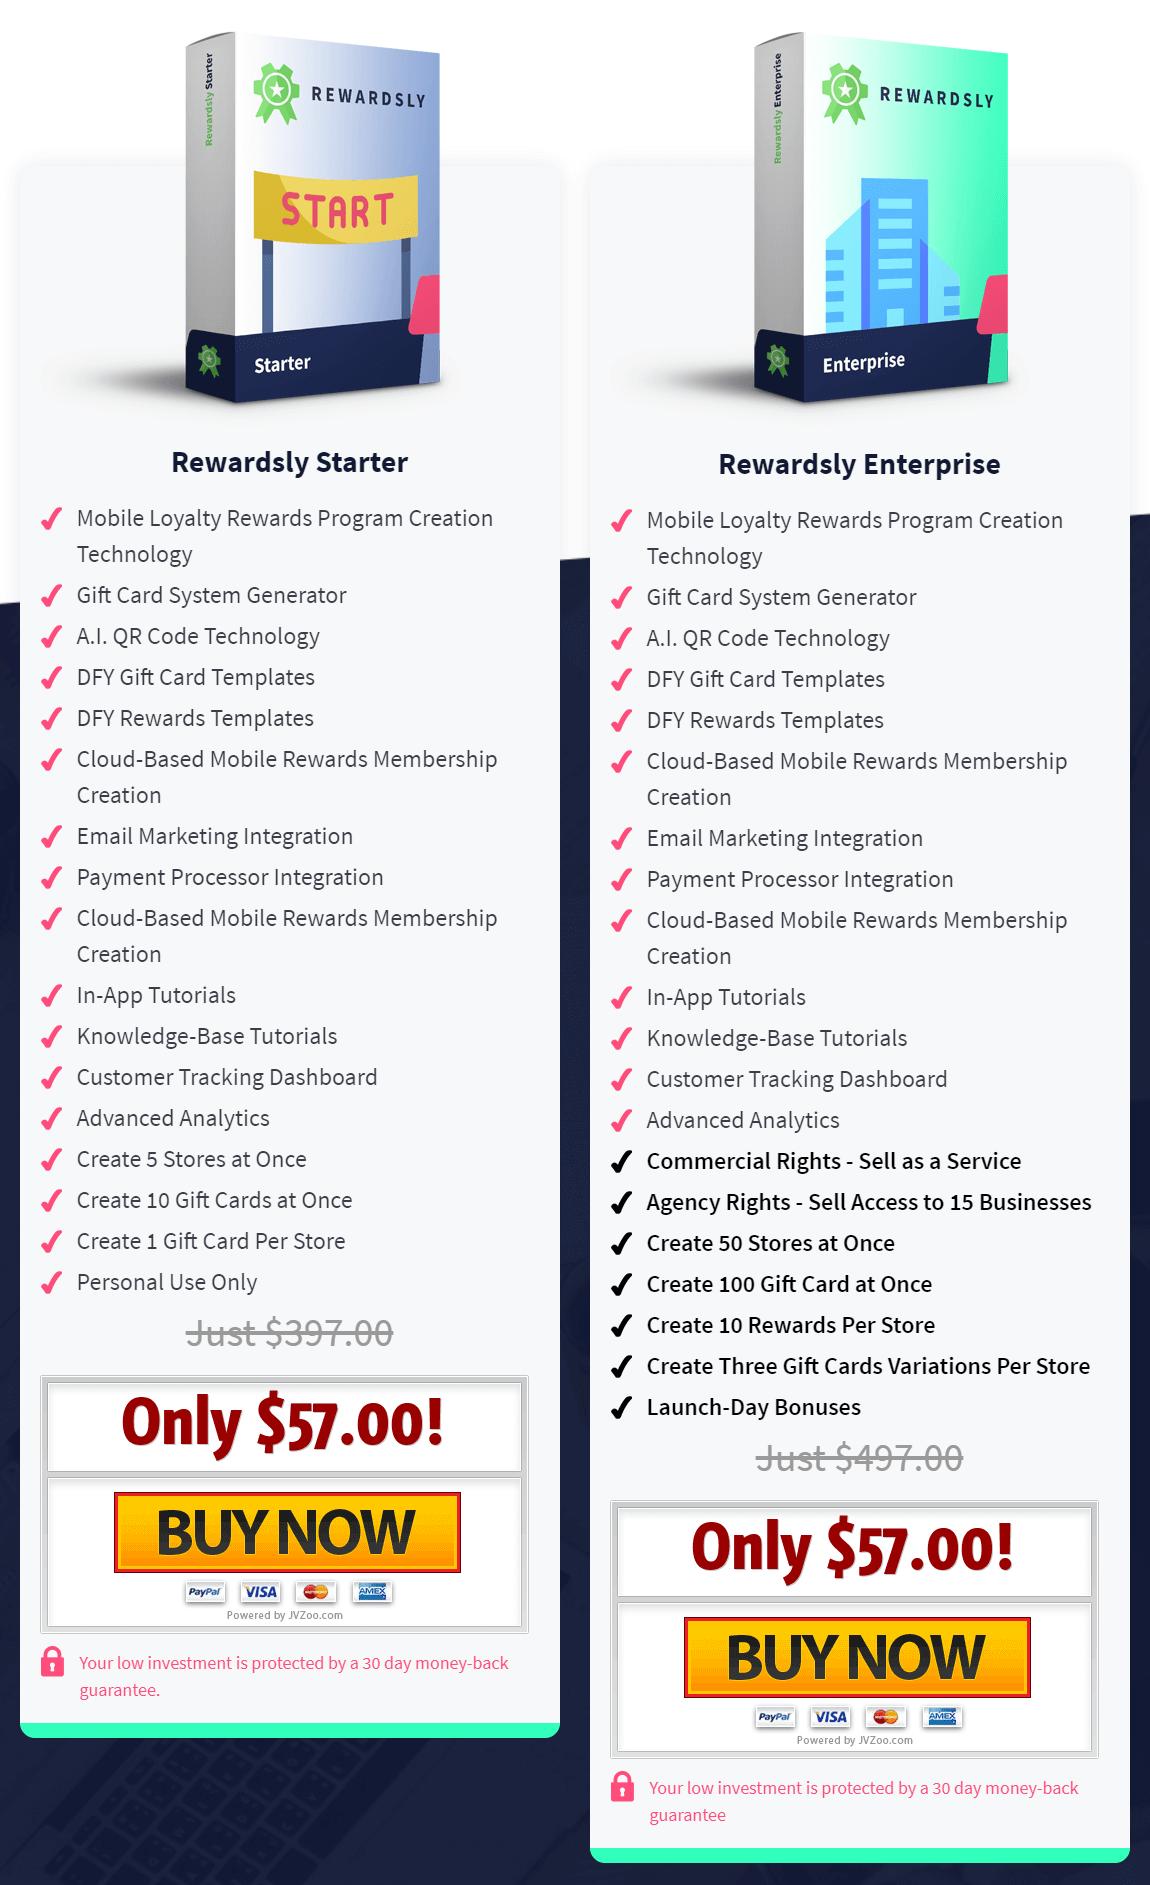 Rewardsly-price